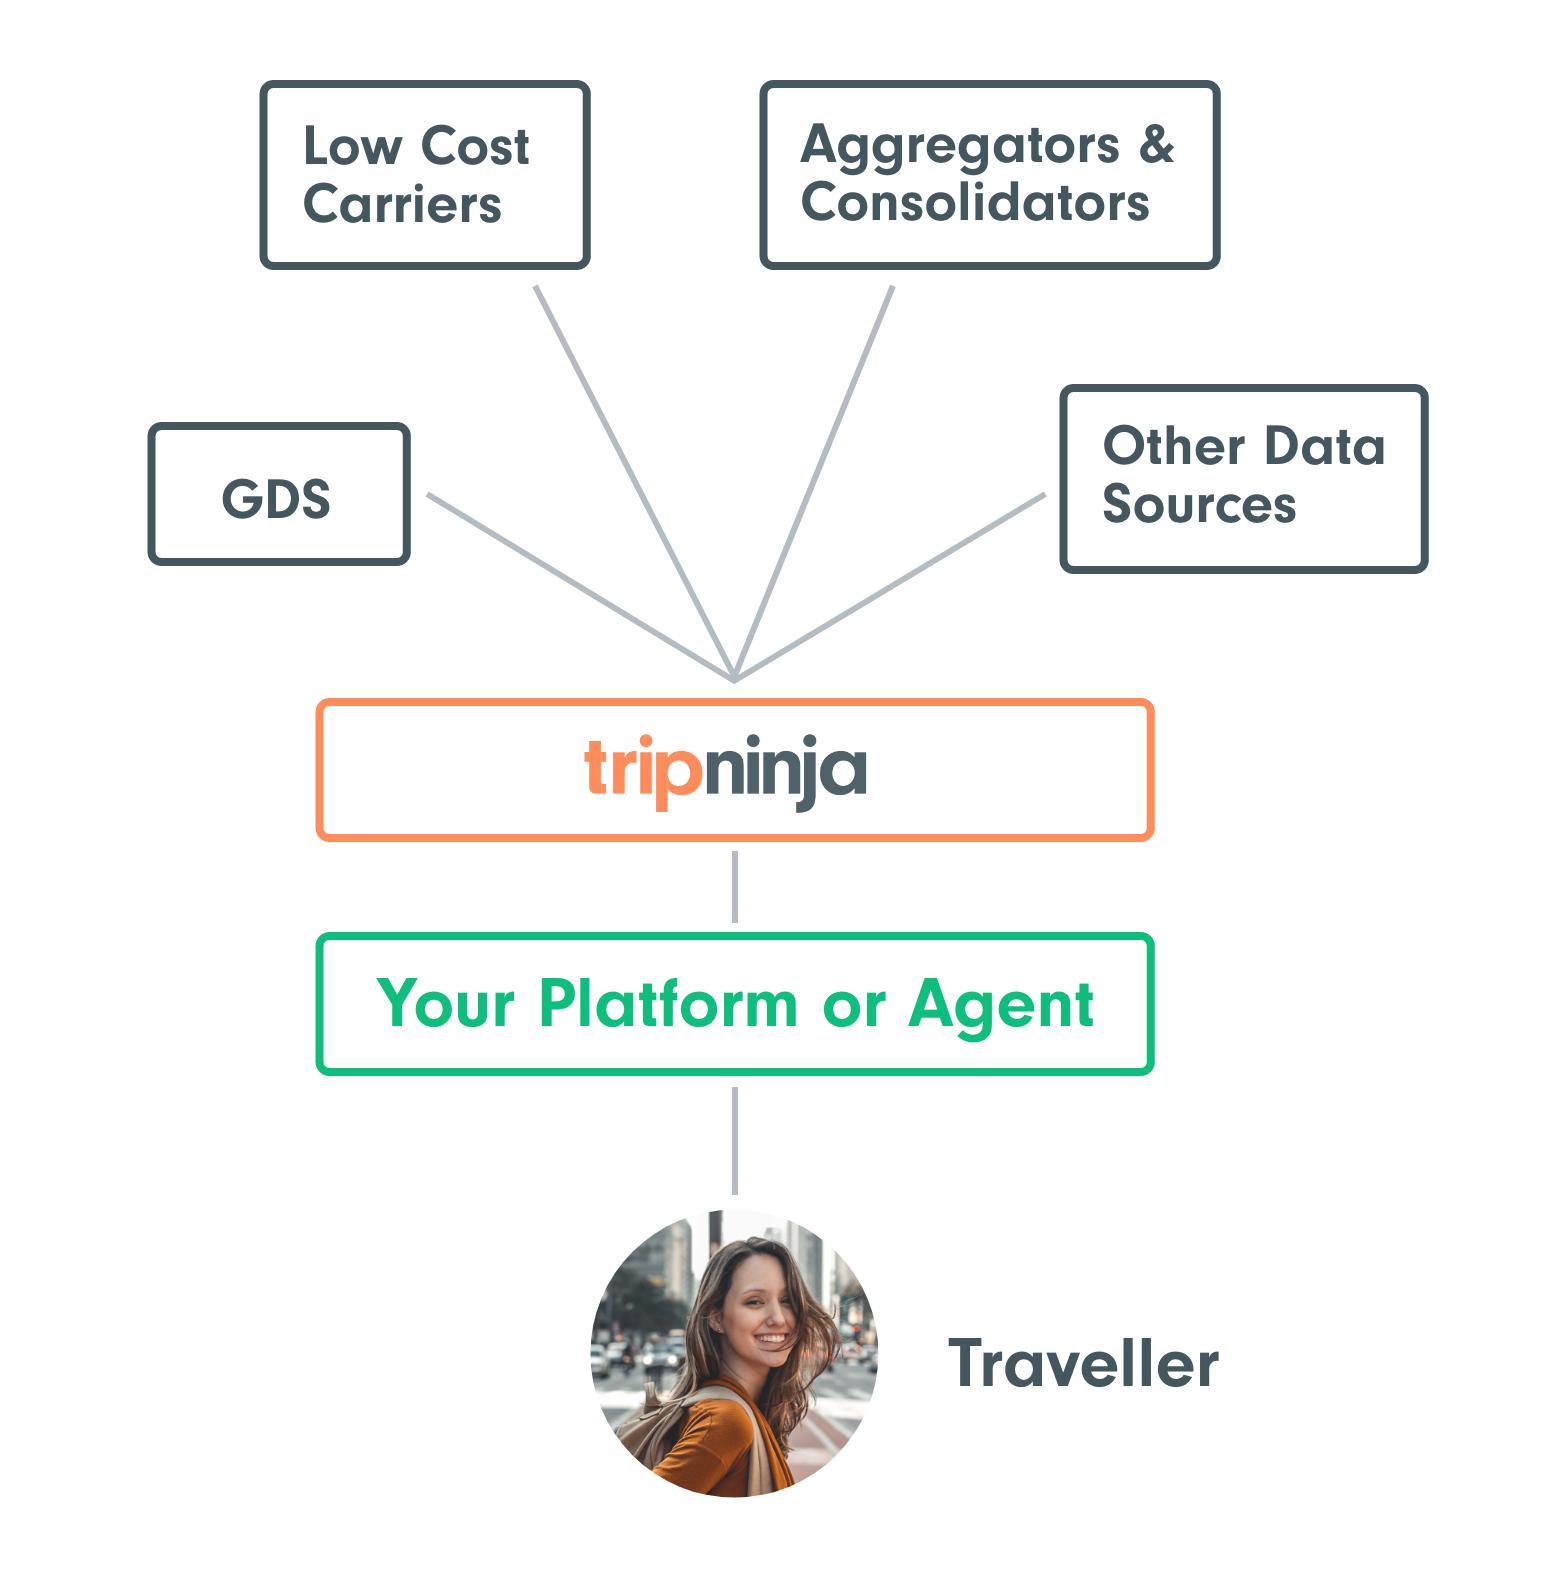 tripninja data sources@2x.png